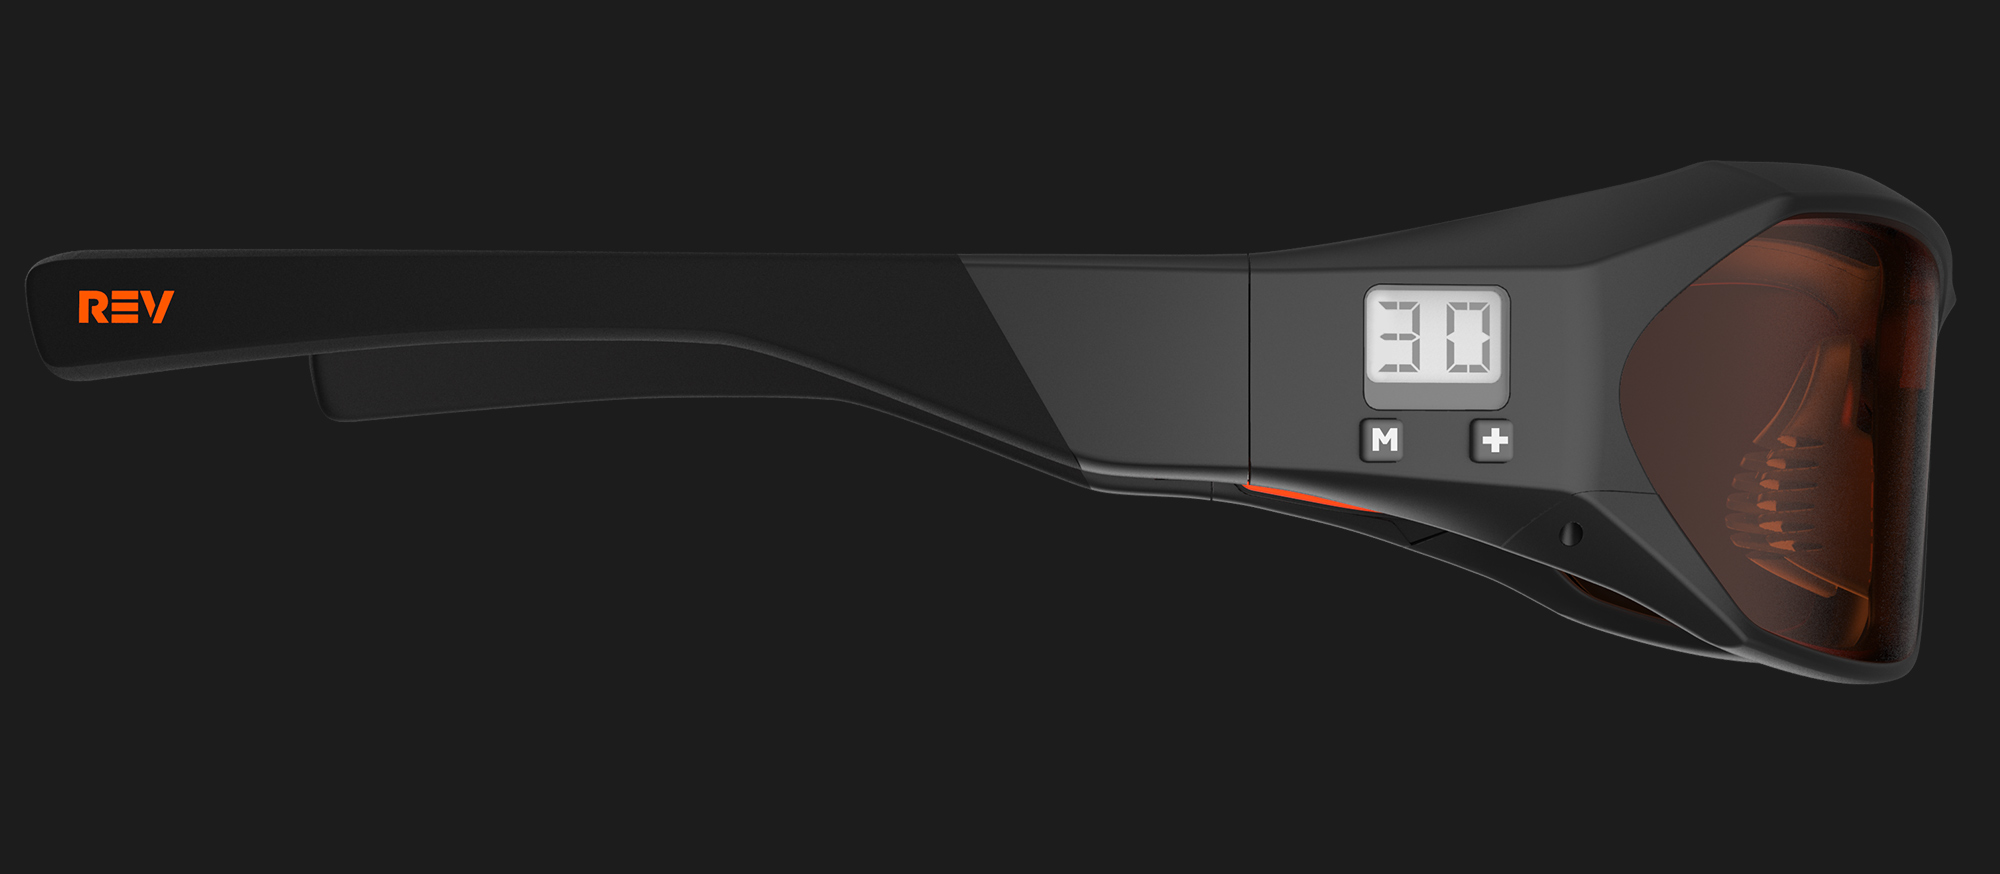 vima-rev-product-render-tactical-02.jpg